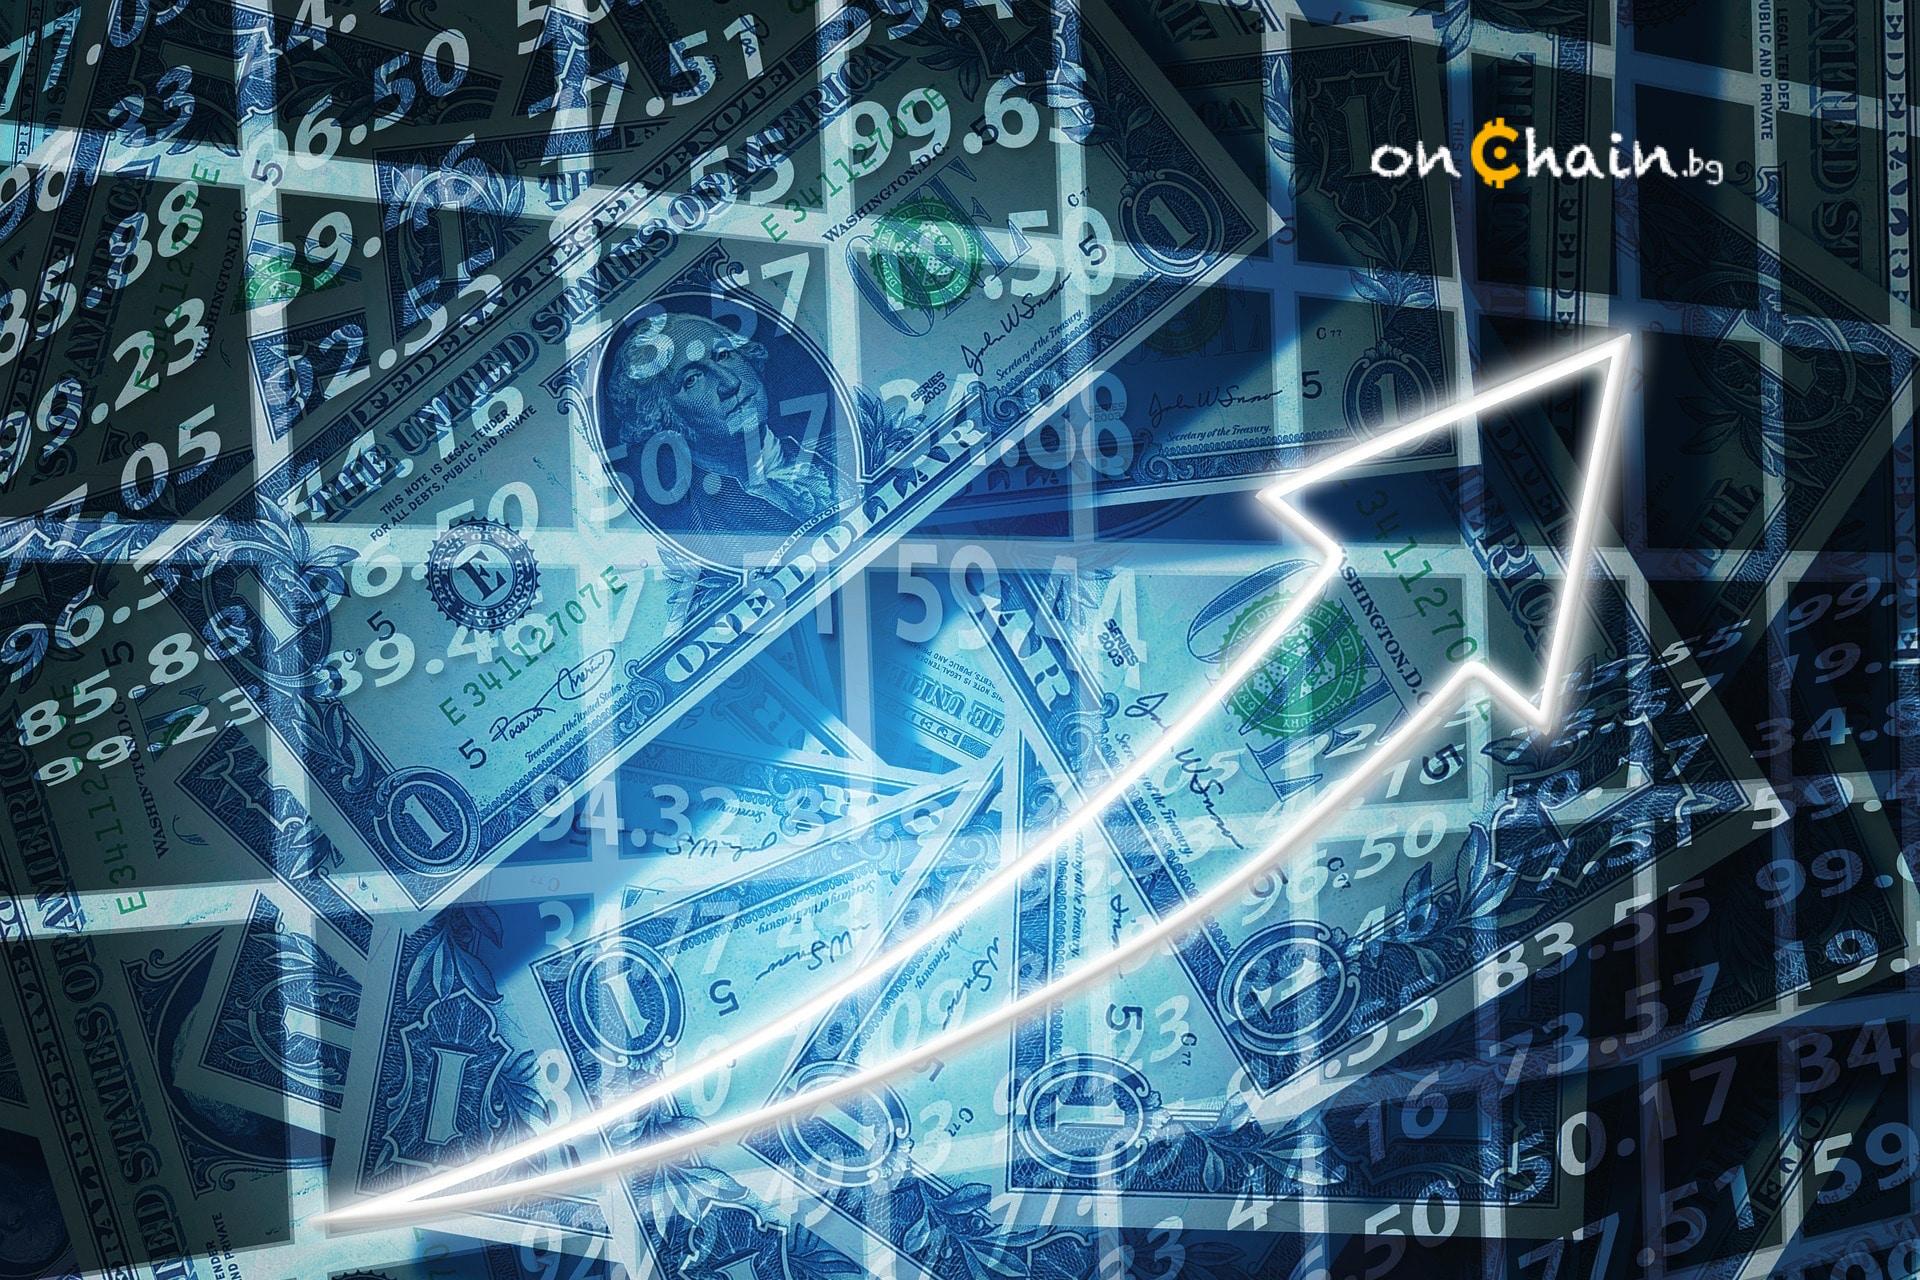 волатилност на крипто пазара